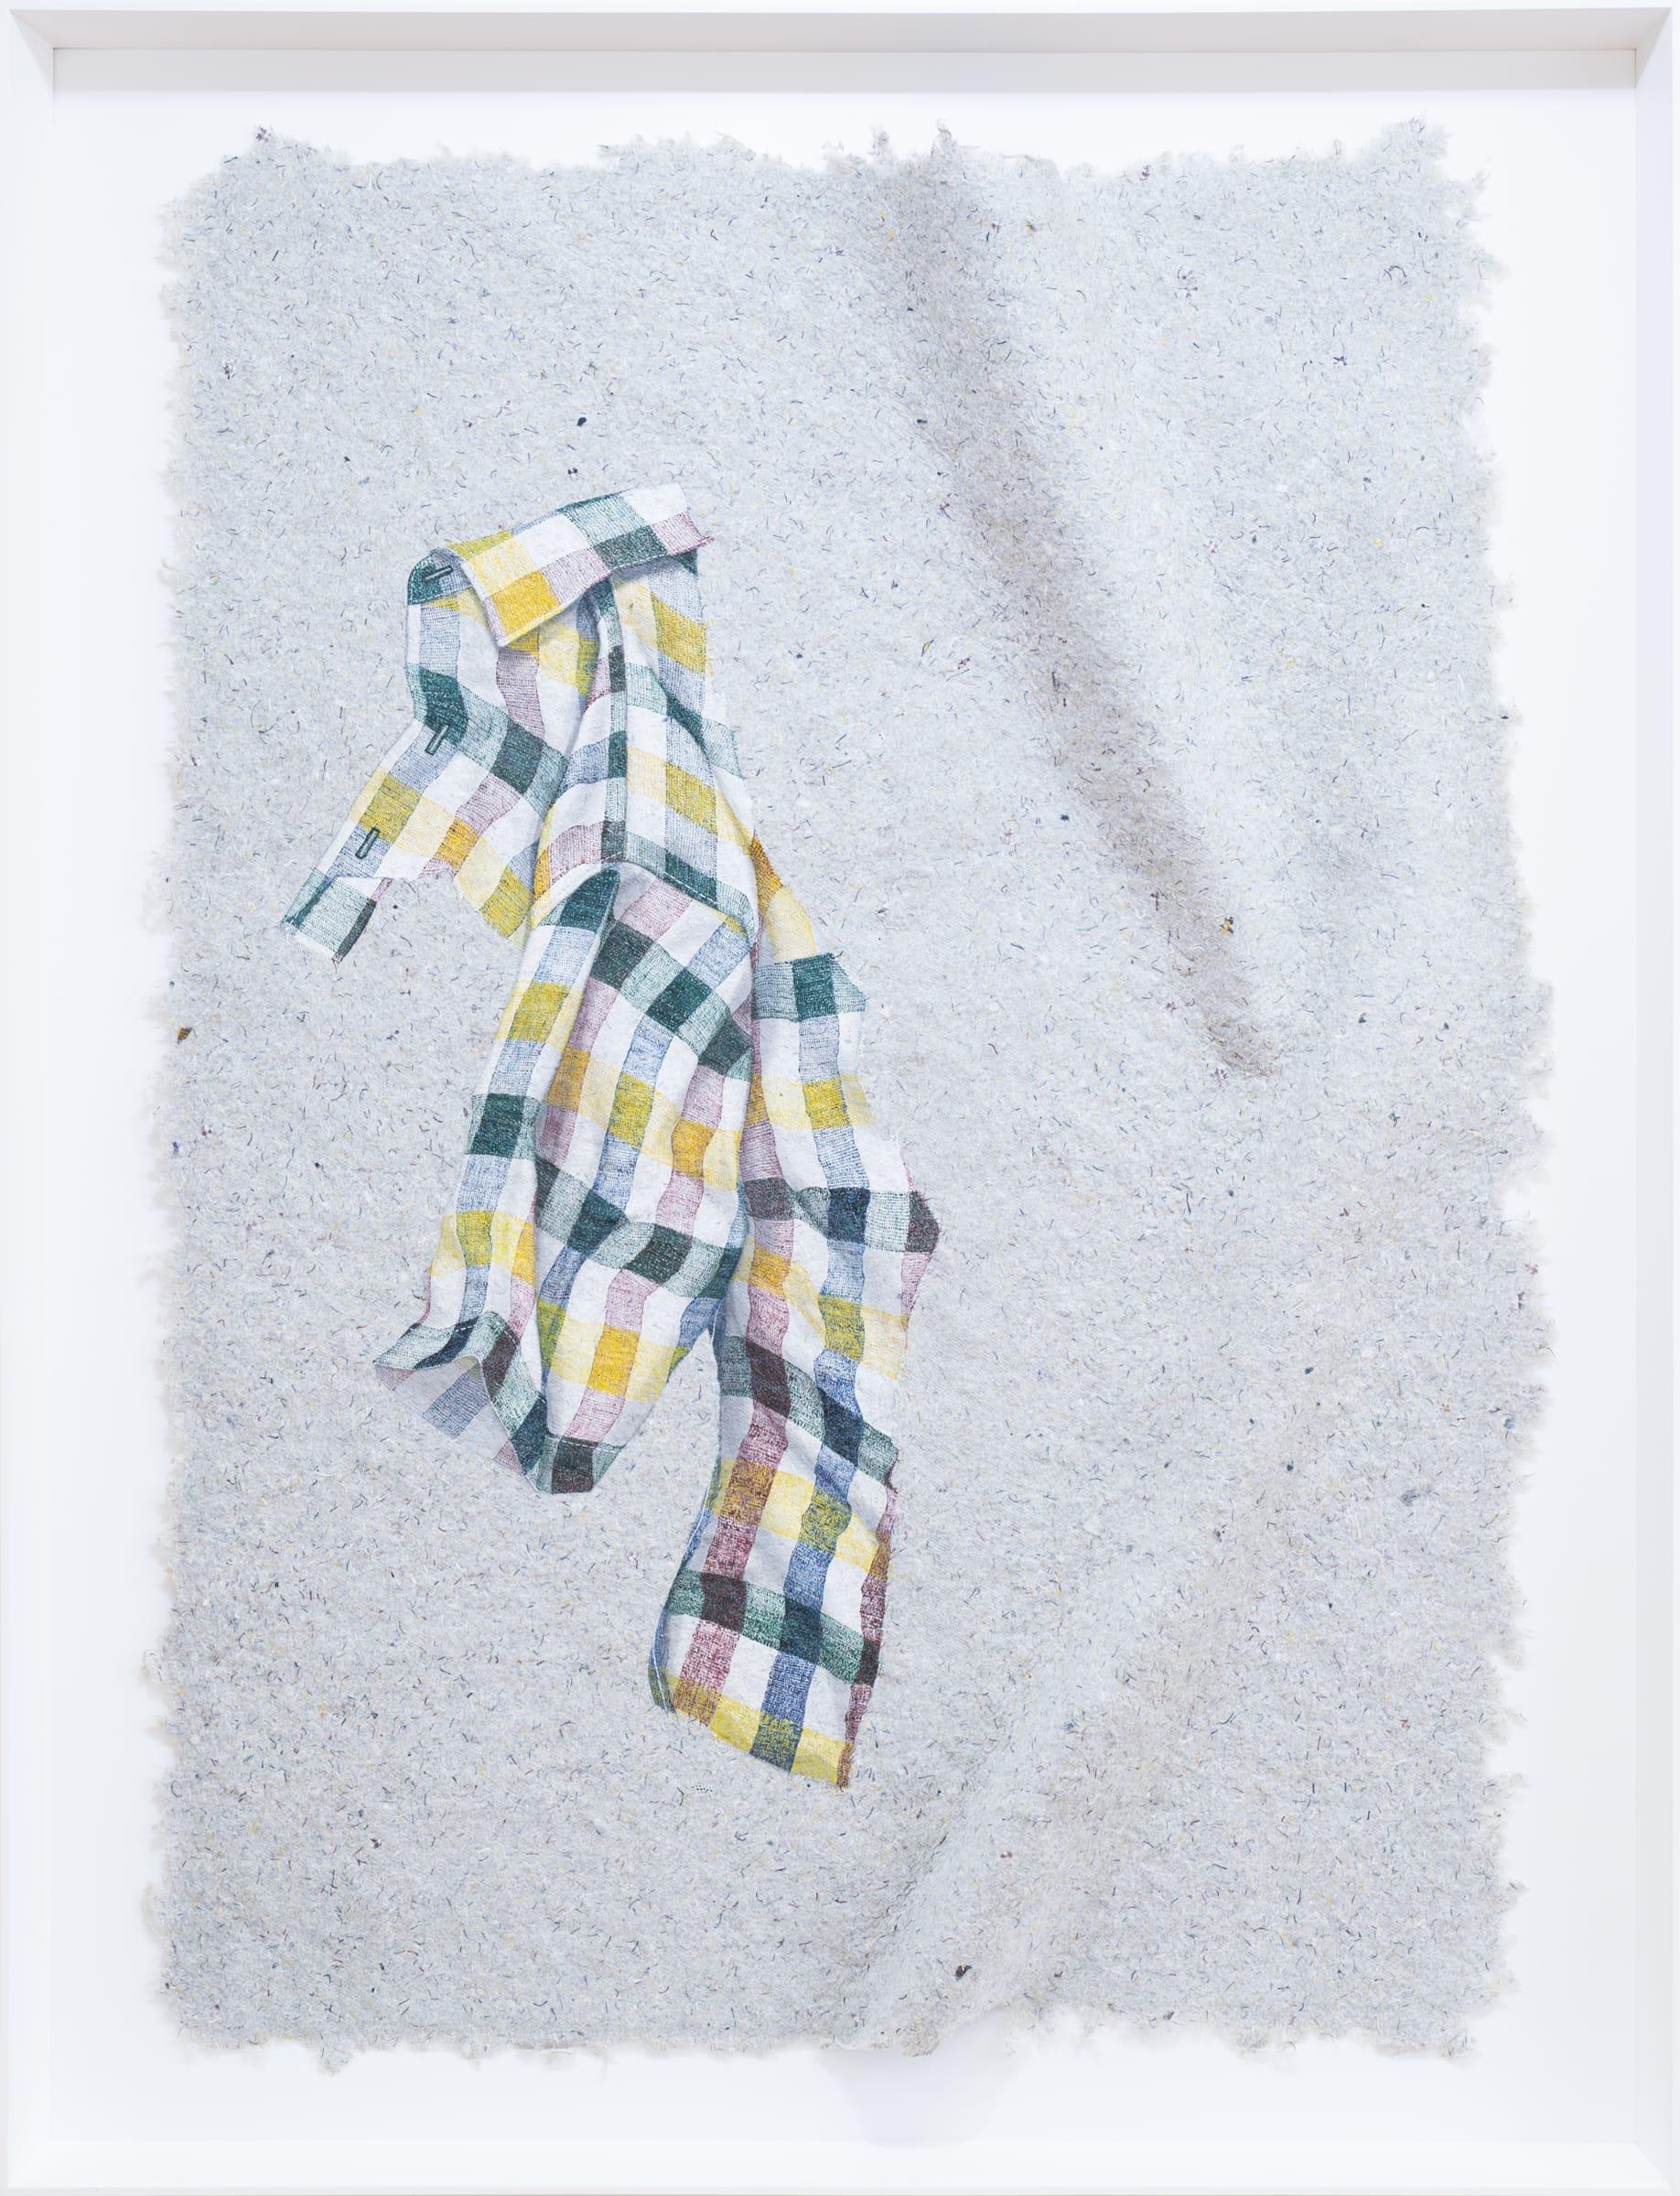 "<span class=""link fancybox-details-link""><a href=""/exhibitions/113/works/artworks8656/"">View Detail Page</a></span><div class=""medium"">Watercolour and gouache on handmade cotton, linen rag paper</div> <div class=""dimensions"">1070mm x 815mm x 70mm</div>"